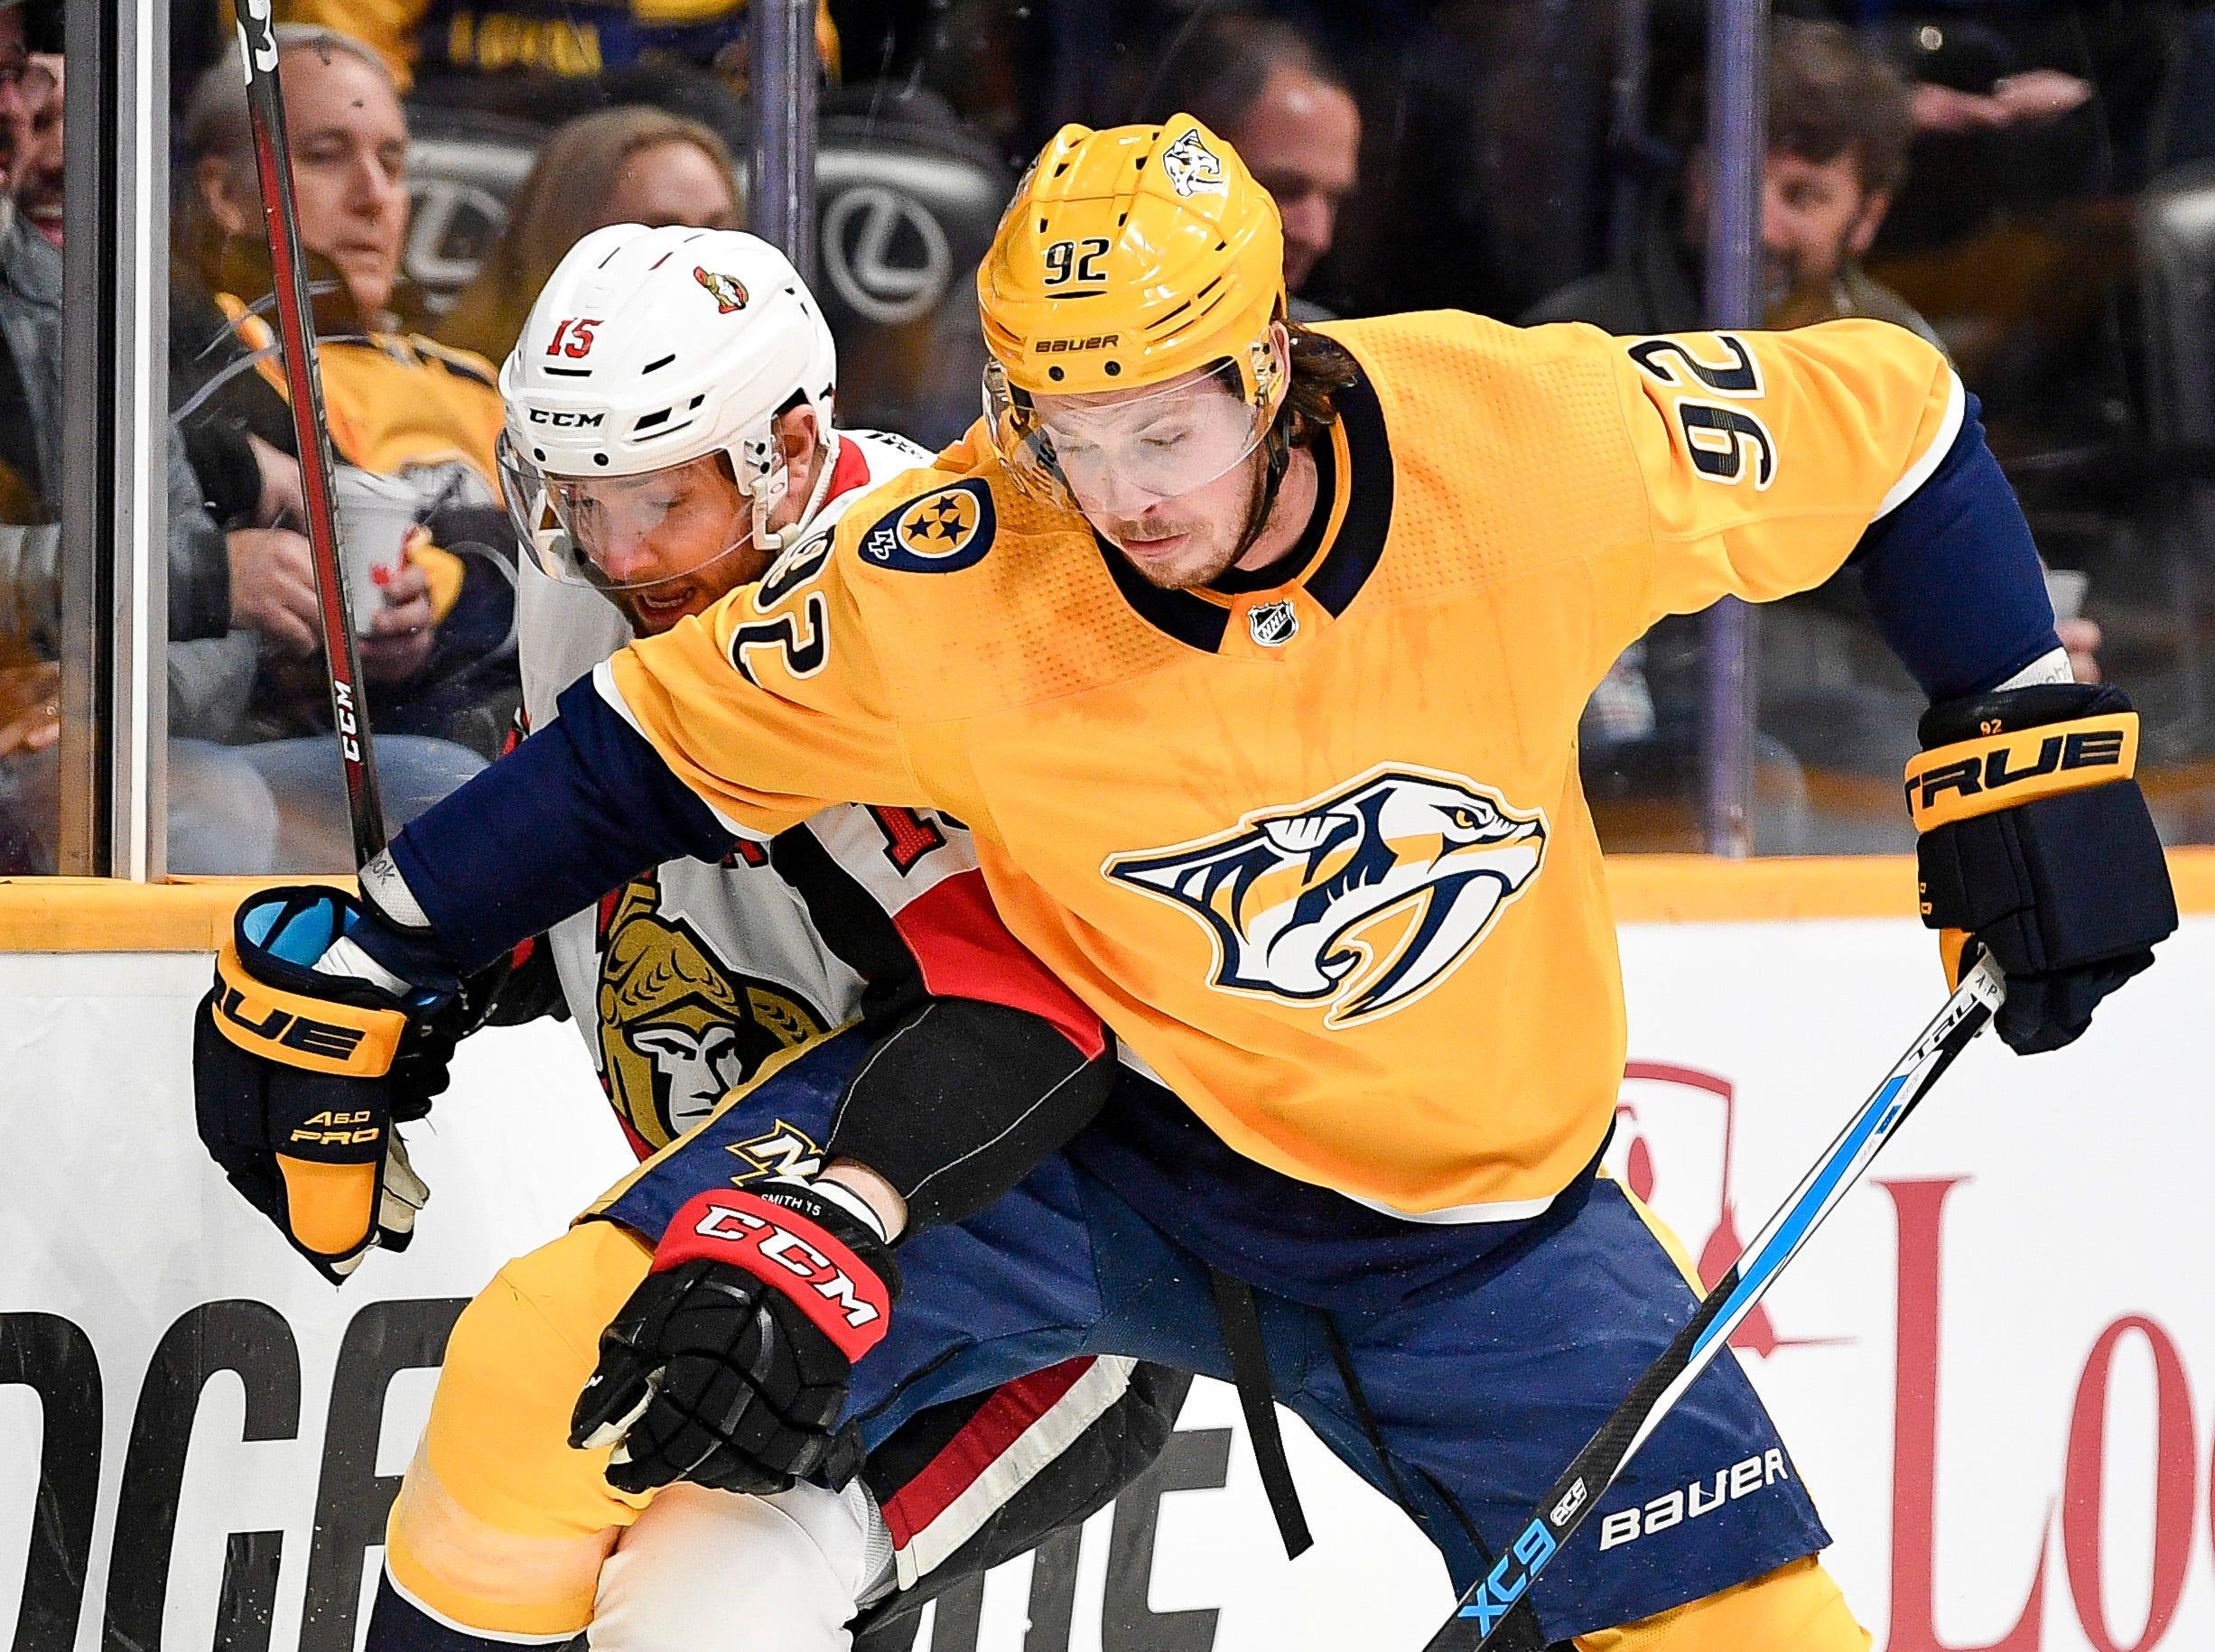 Nashville Predators center Ryan Johansen (92) collides into Ottawa Senators left wing Zack Smith (15) during the first period at Bridgestone Arena in Nashville, Tenn., Tuesday, Dec. 11, 2018.